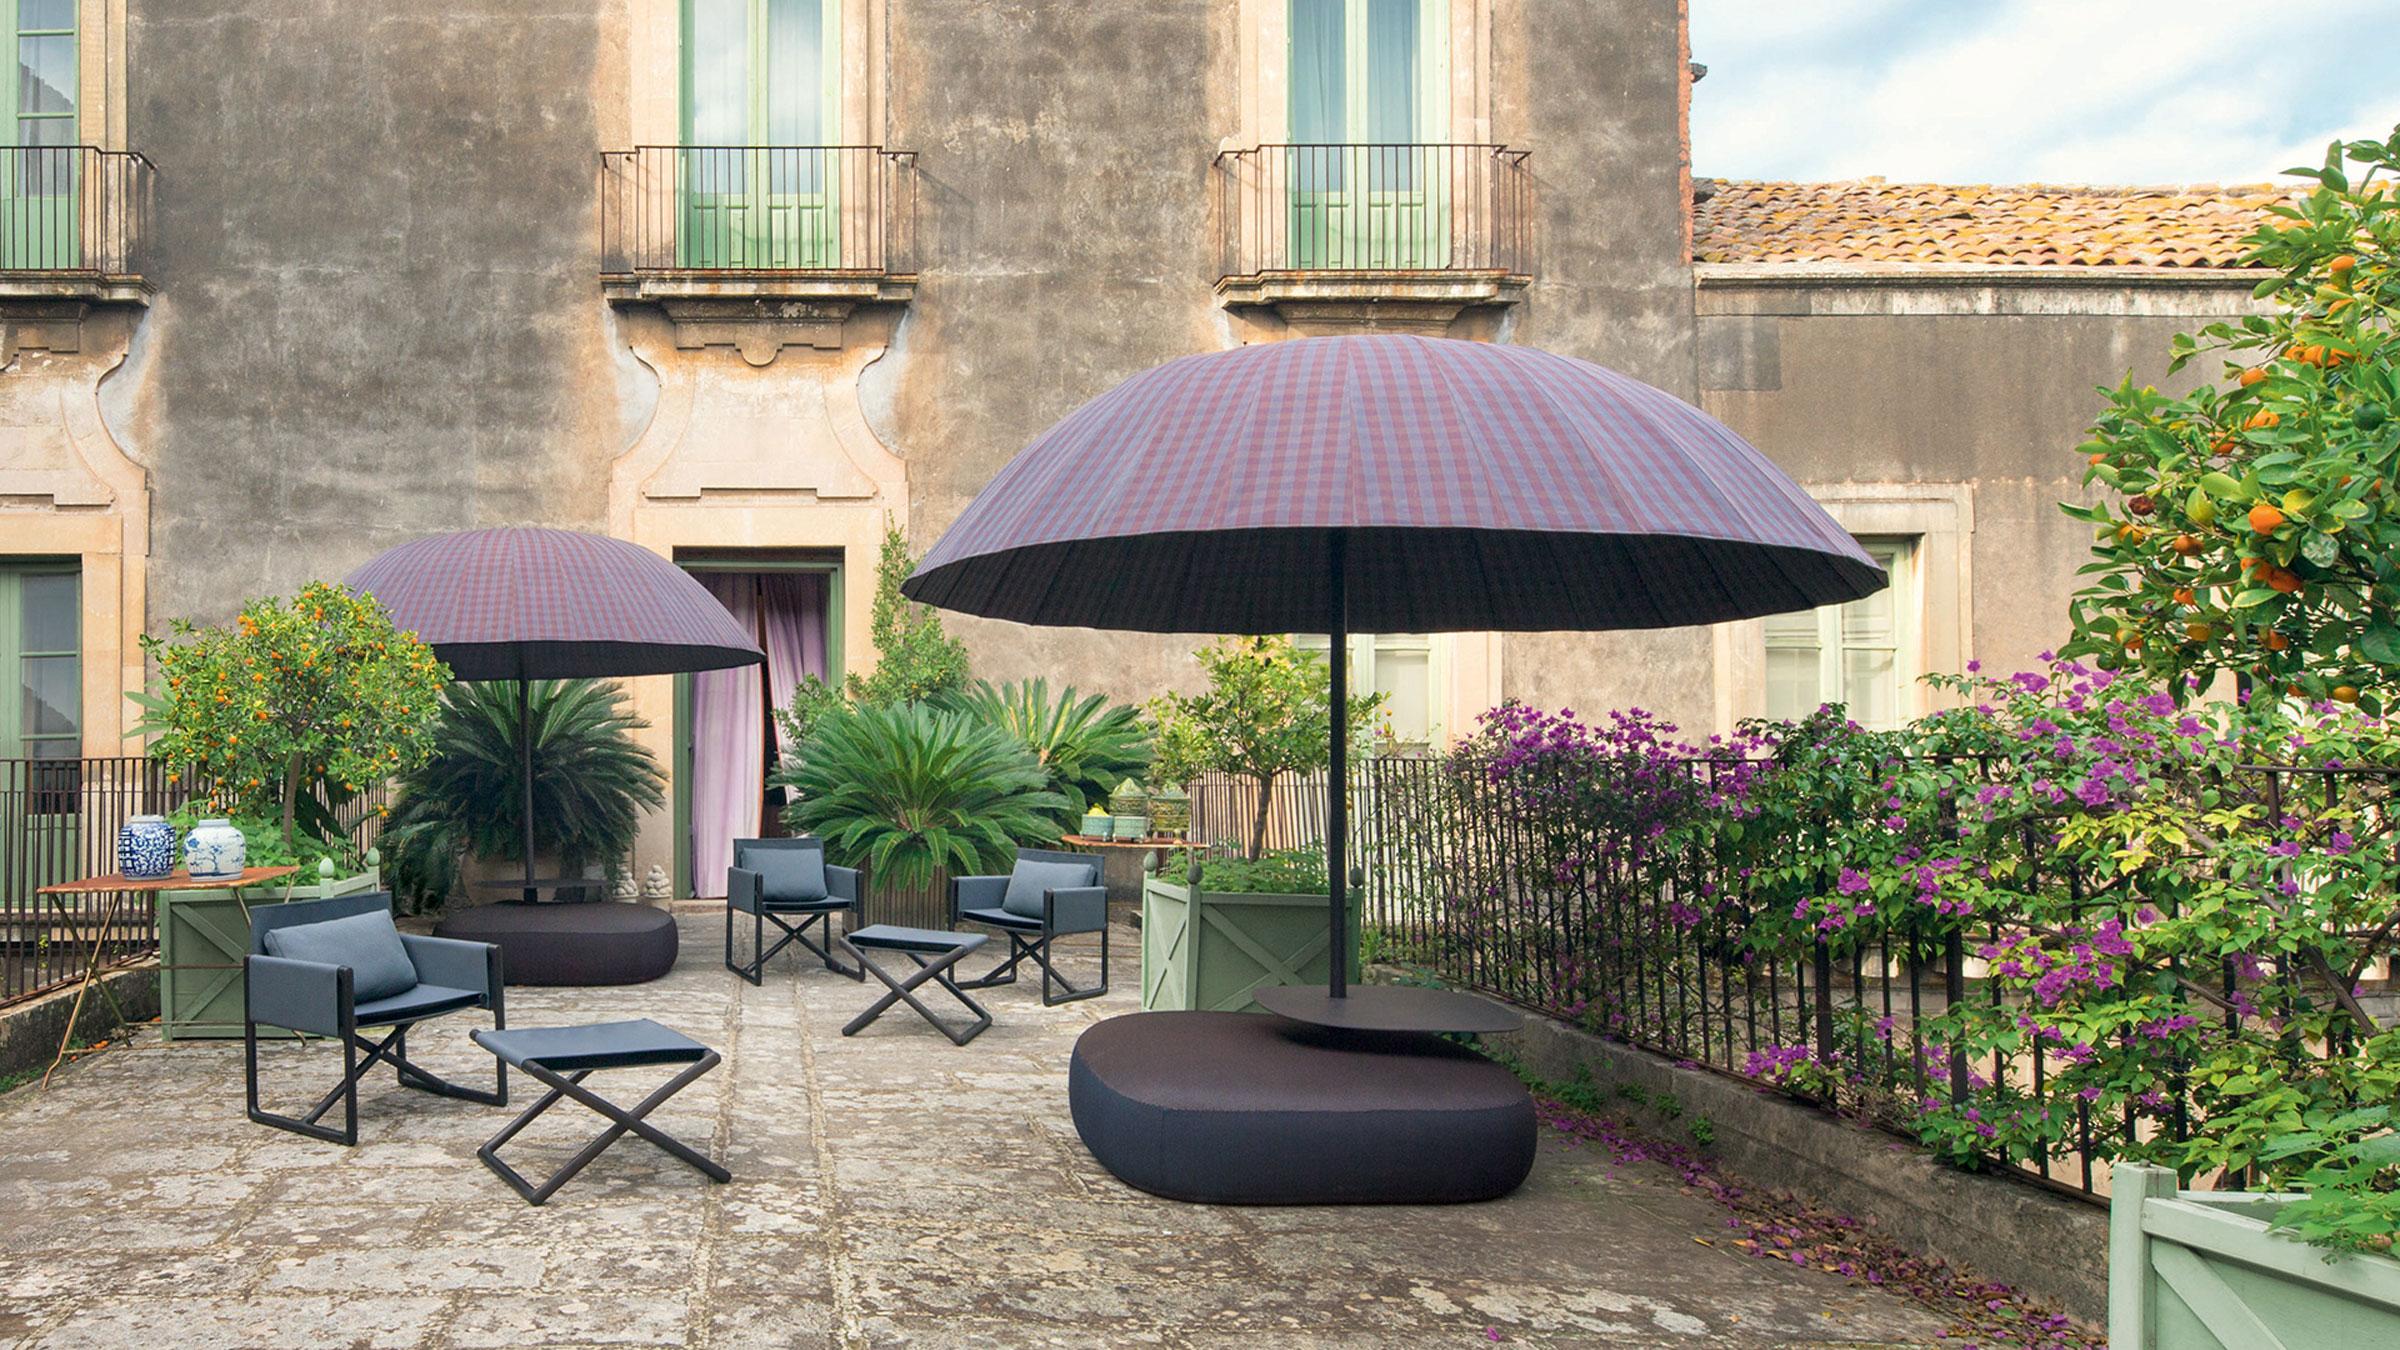 hauser-design-paola-lenti-sonnenschirm-violette